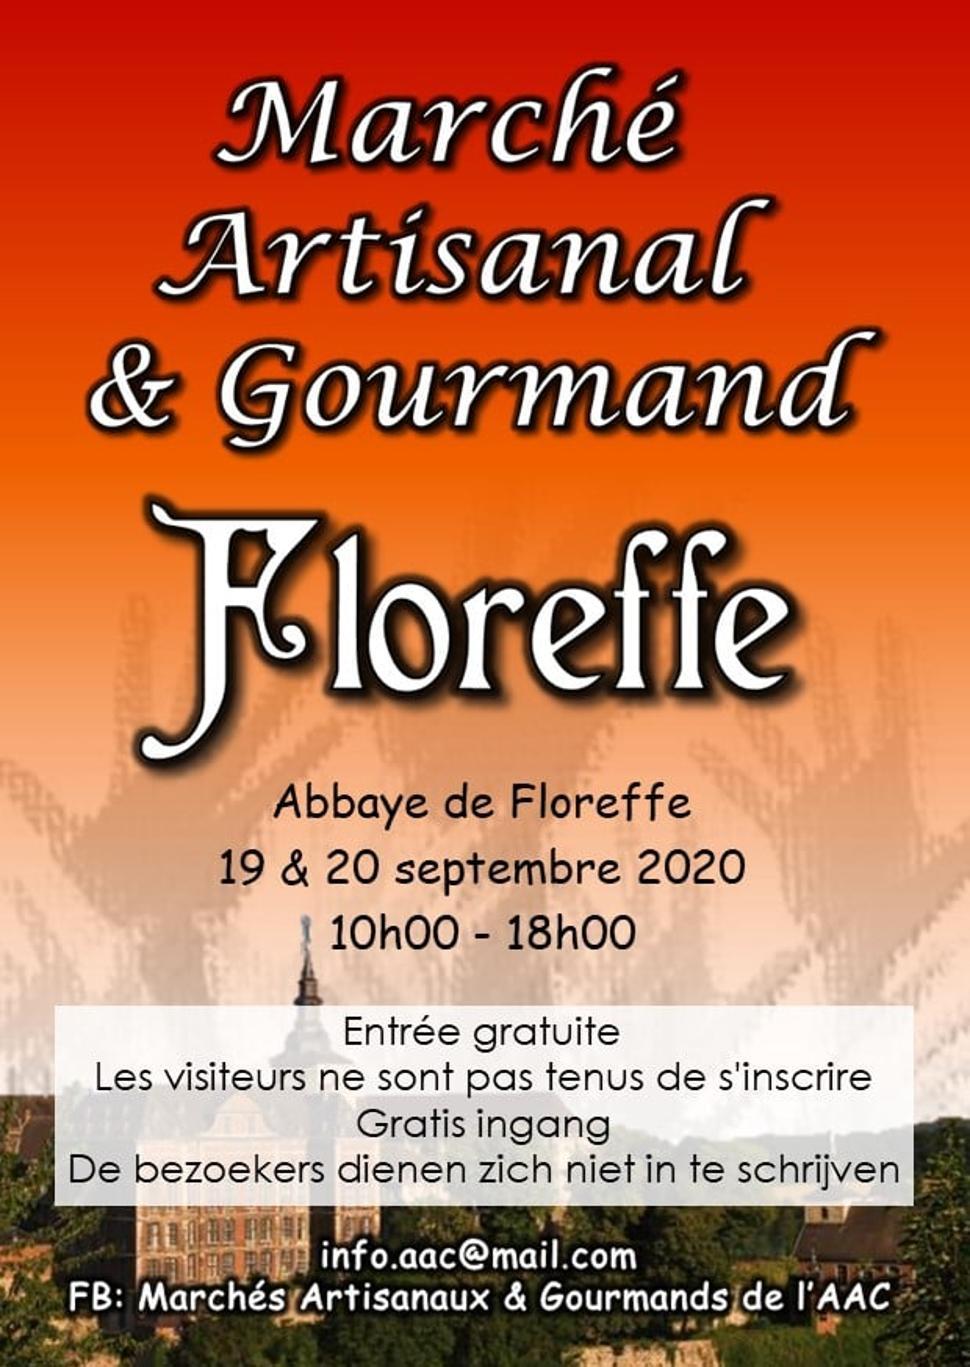 Marché artisanal & gourmand de floreffe 2020